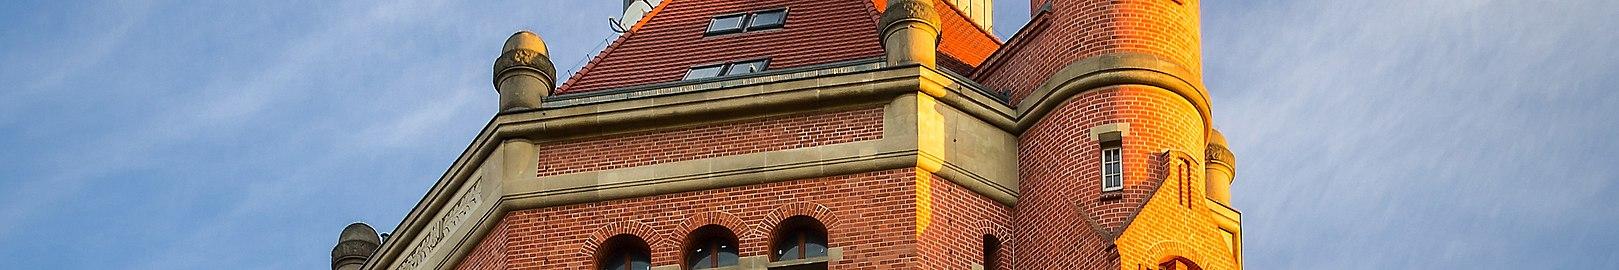 Wroclaw Wieza Cisnien (cropped).jpg